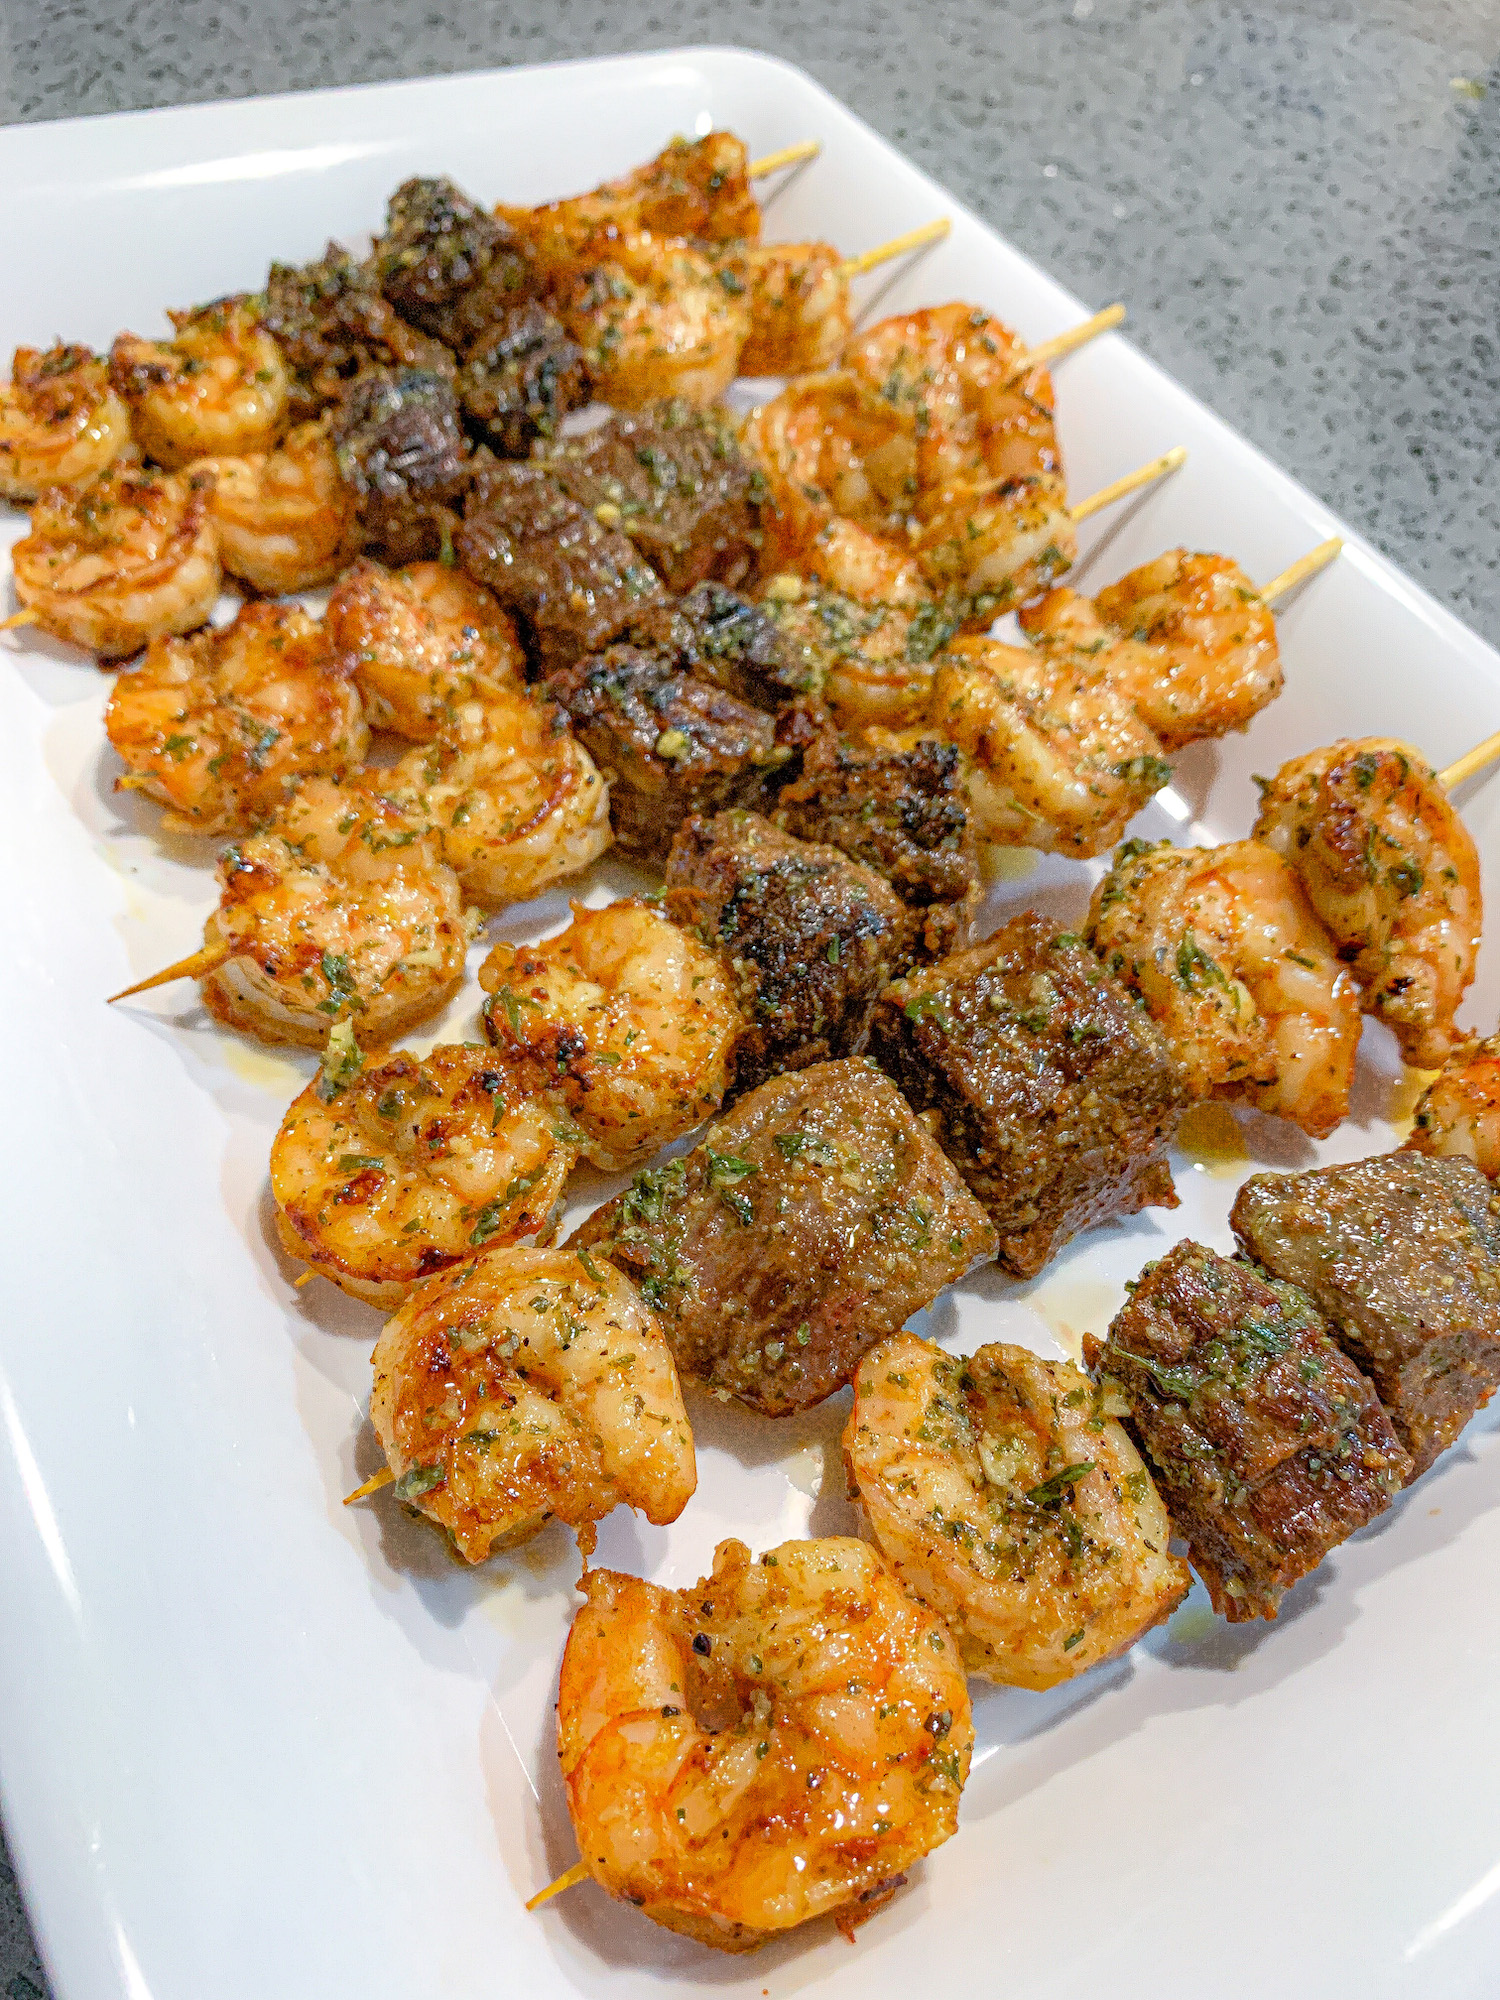 Grilled Spicy Garlic Butter Steak and Shrimp Kabobs